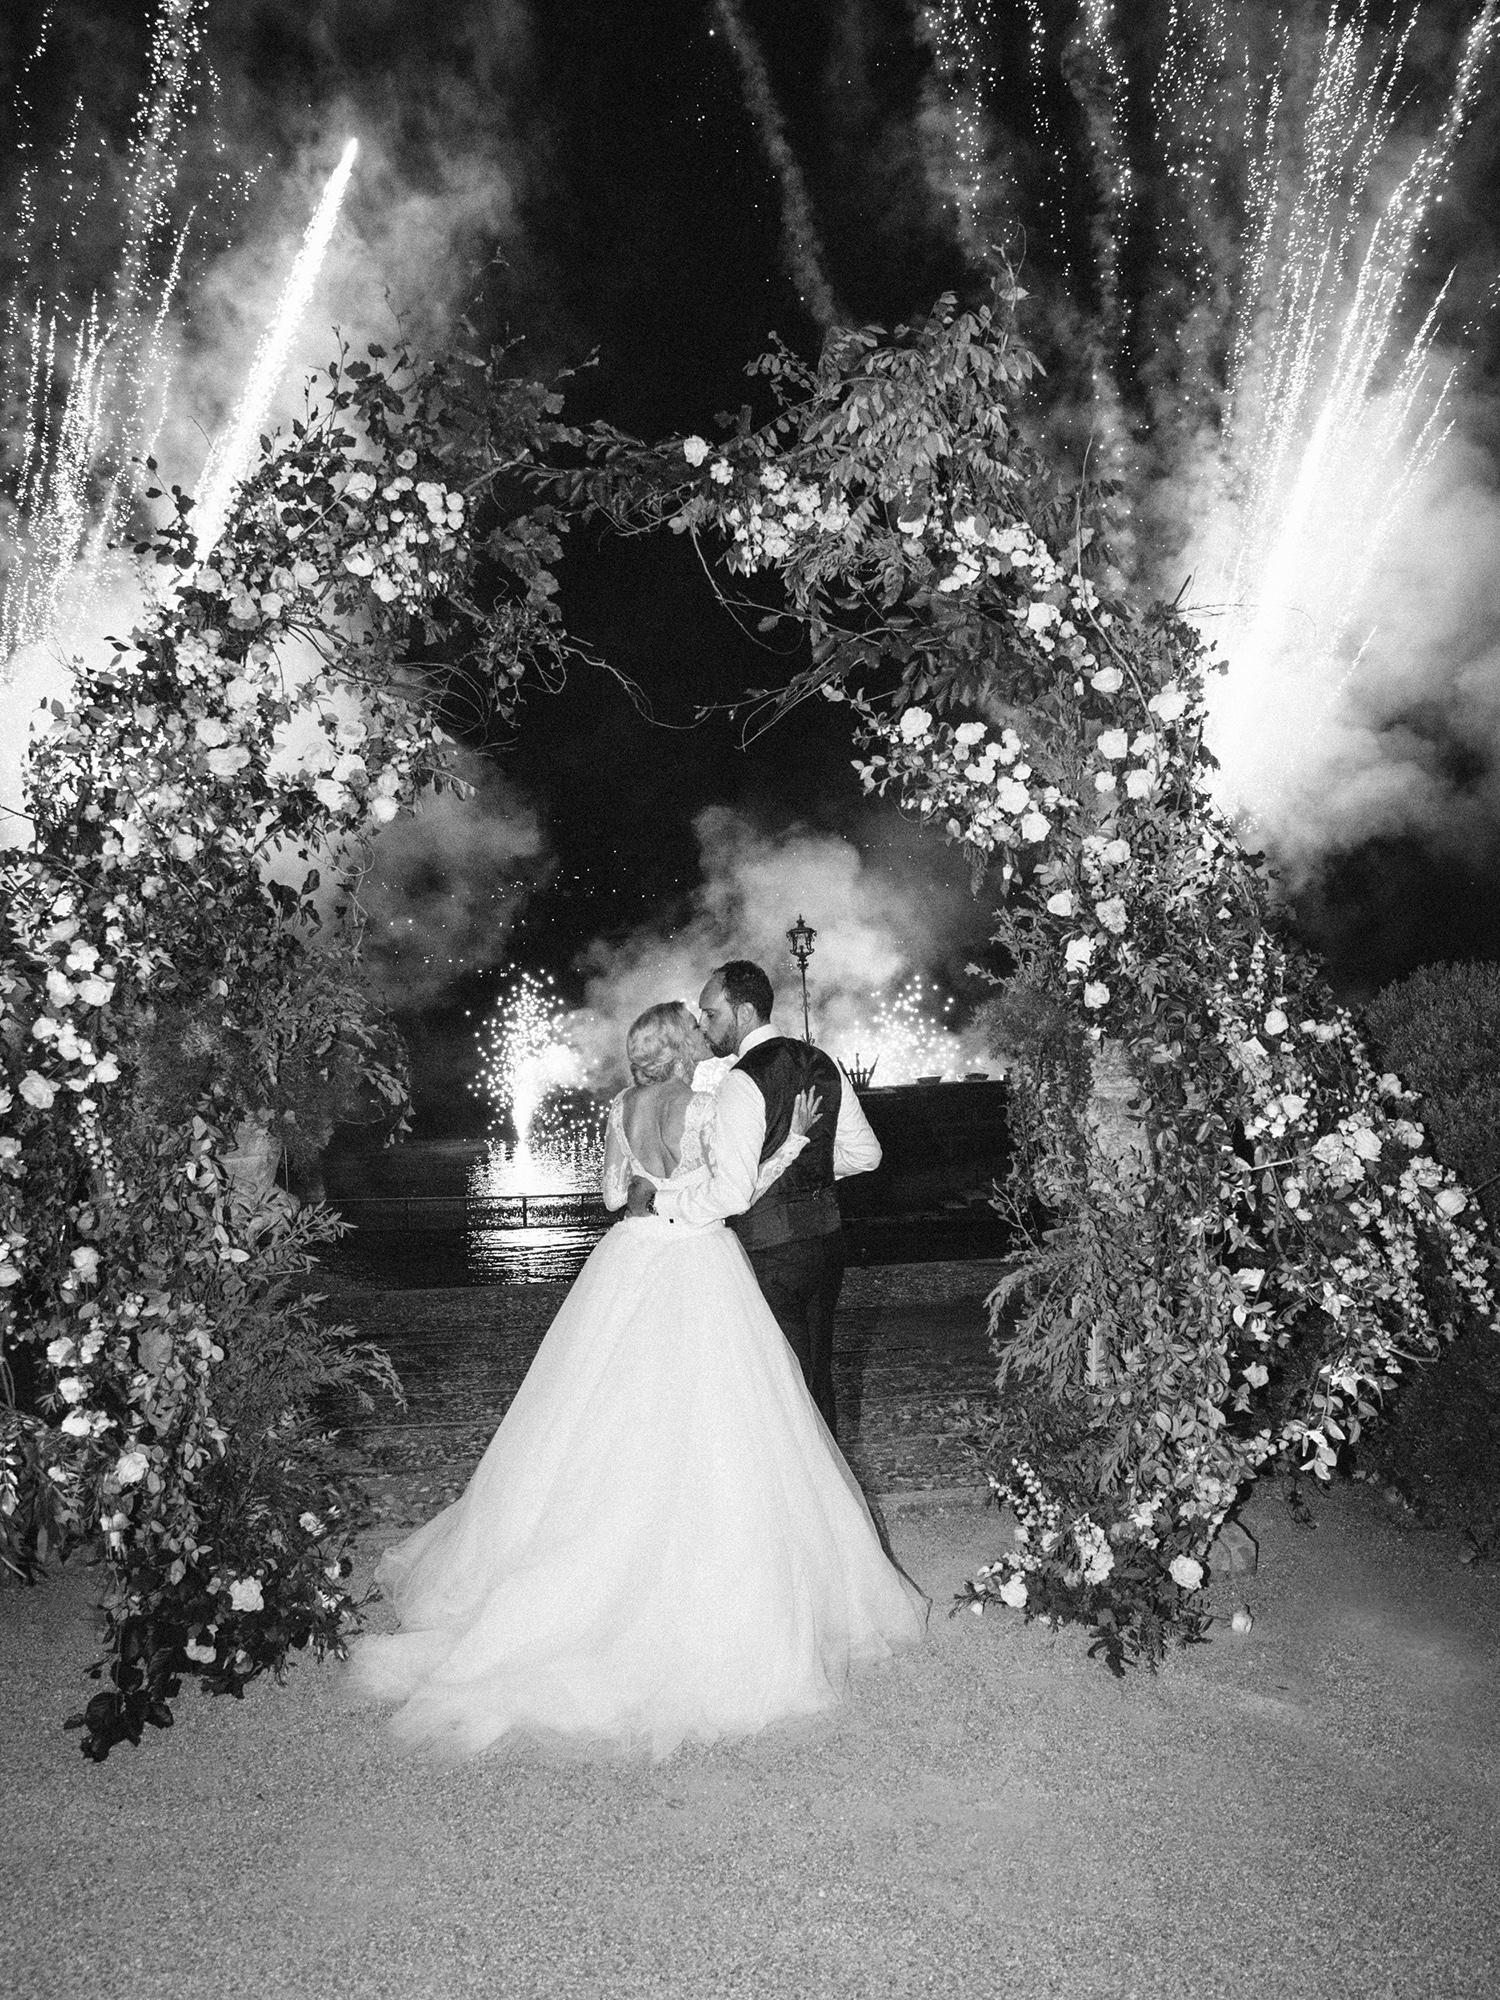 julia mauro wedding couple under fireworks